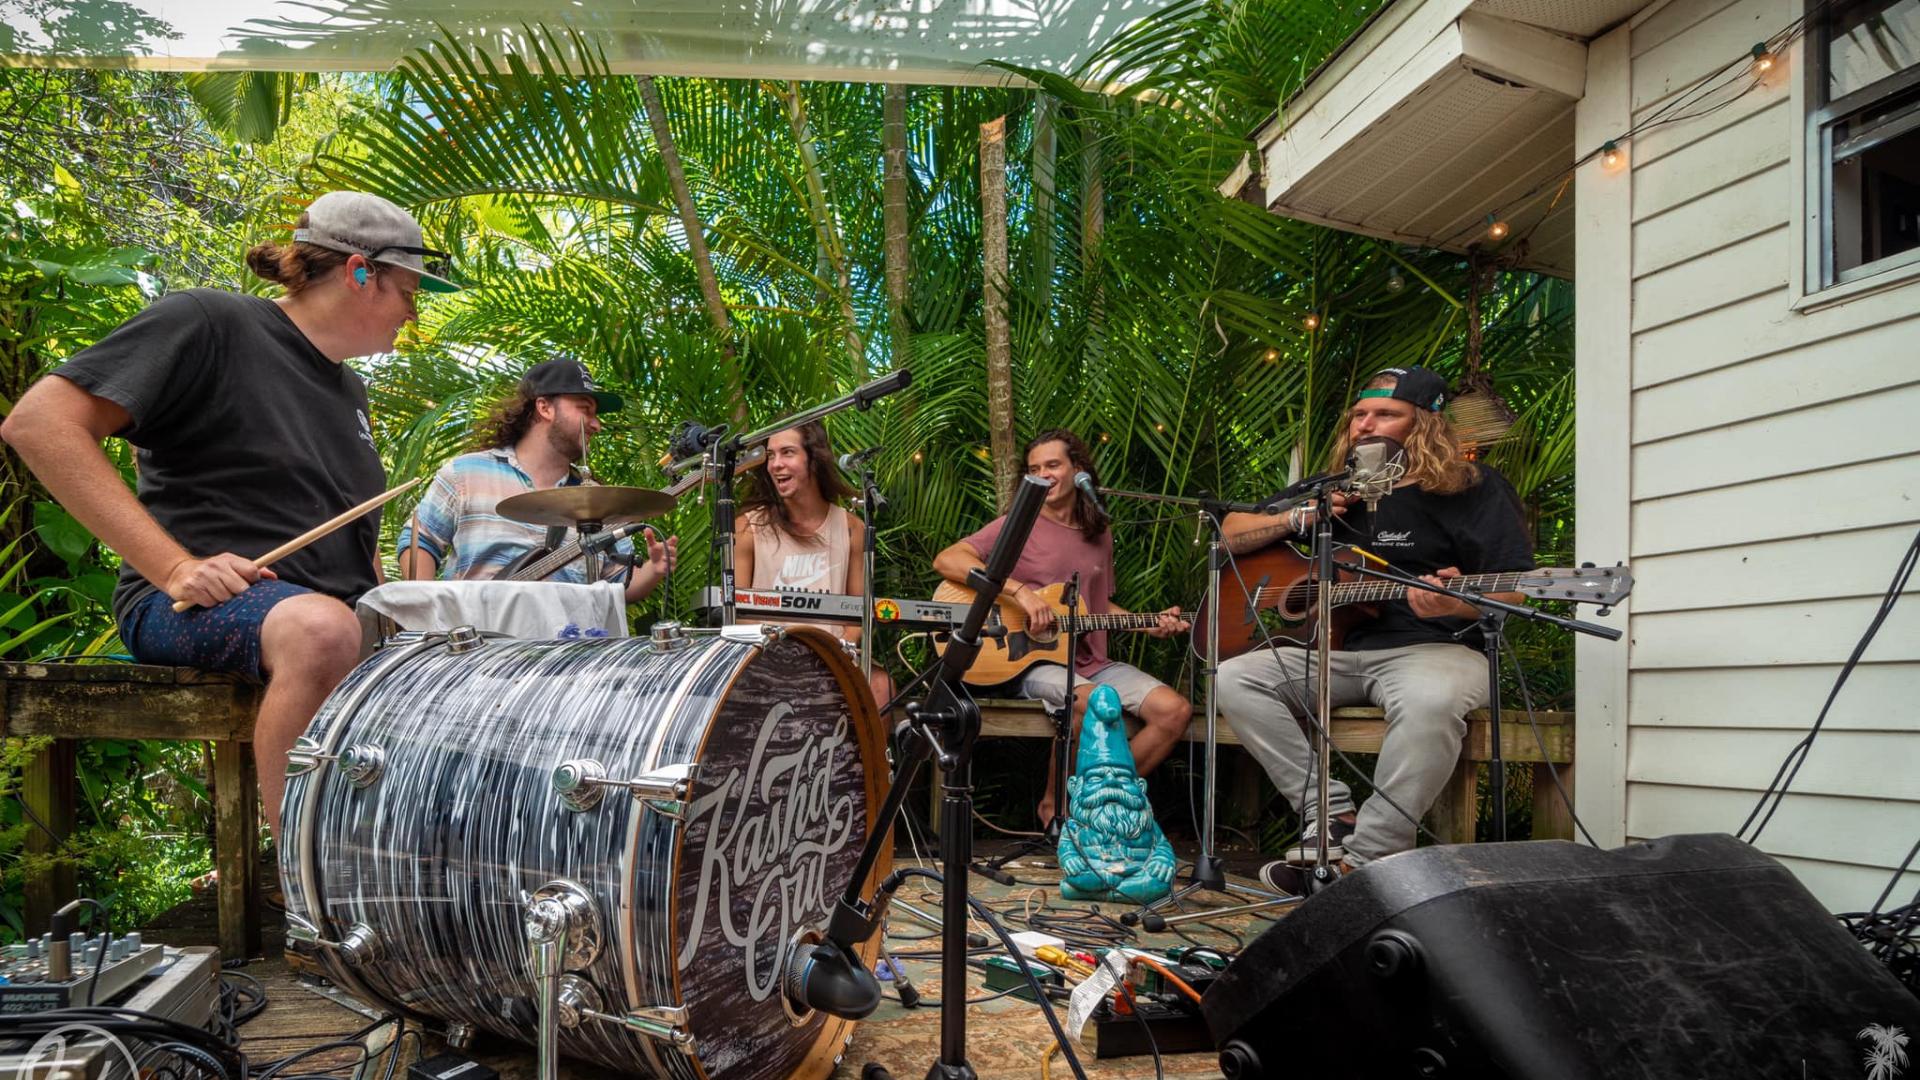 Kash'd Out, banda de Reggae/ska de Orlando, FL en Tropical Punk Records